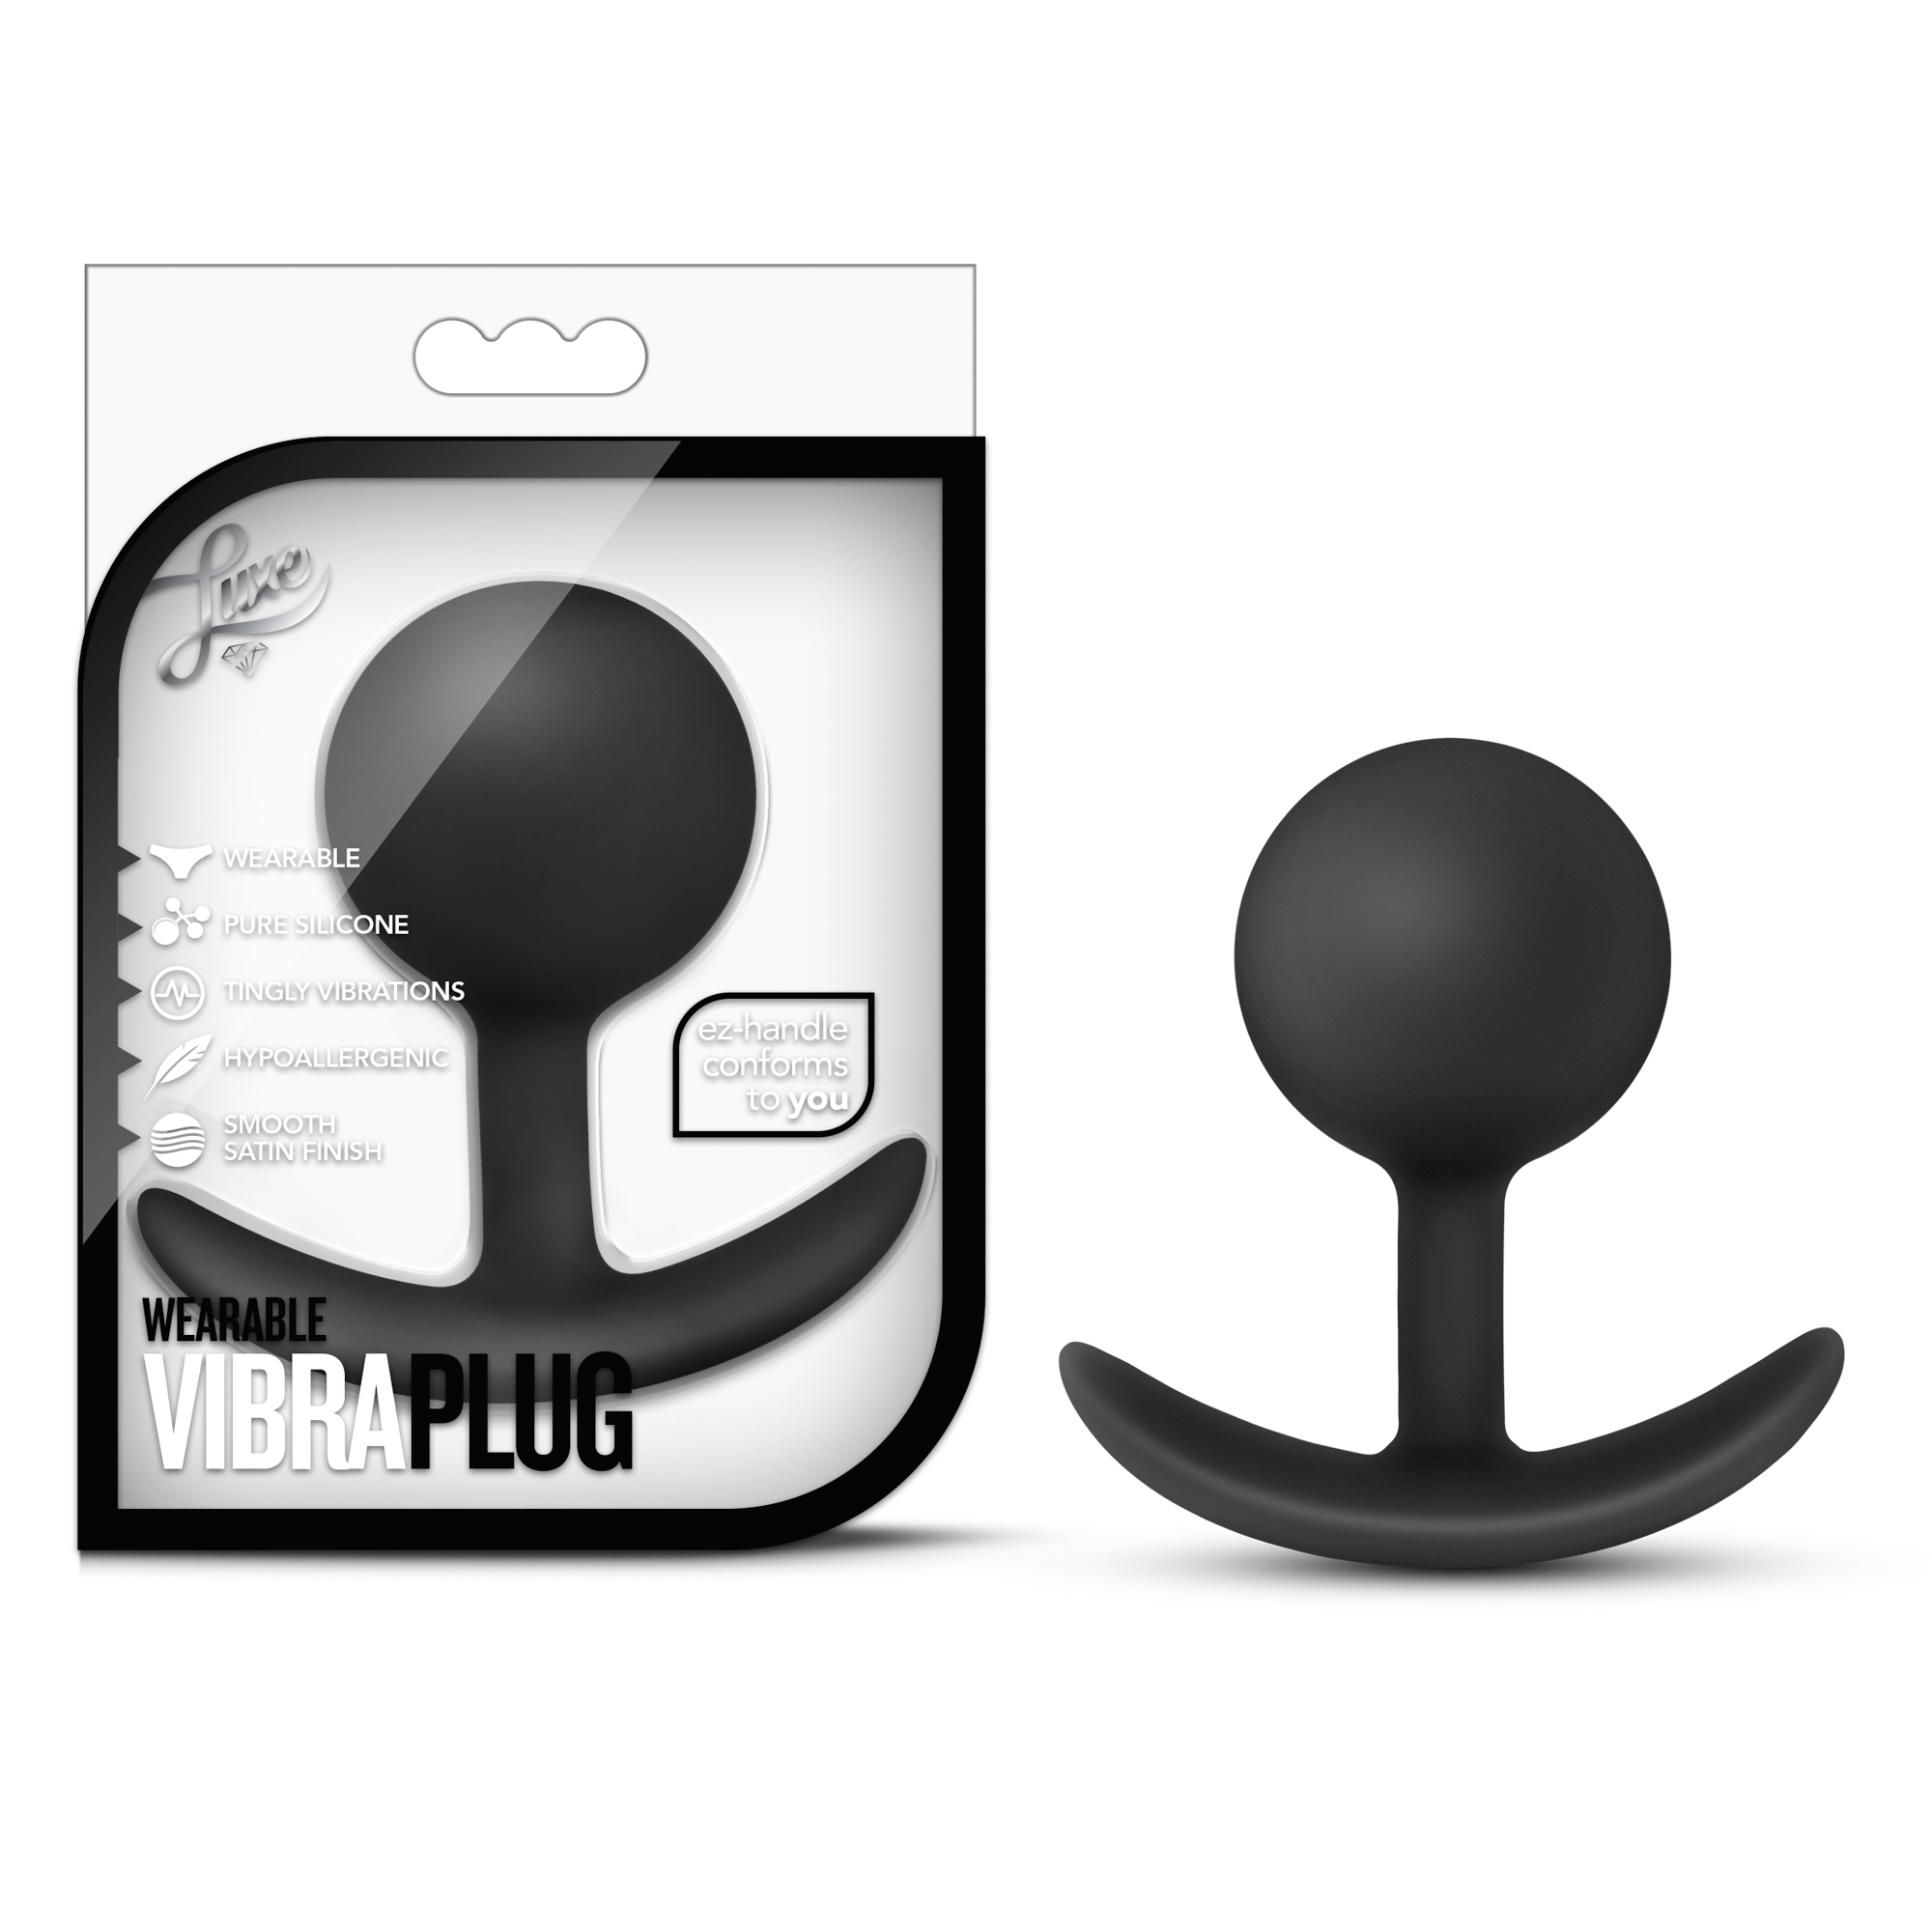 Luxe - Wearable Vibra Plug - Black